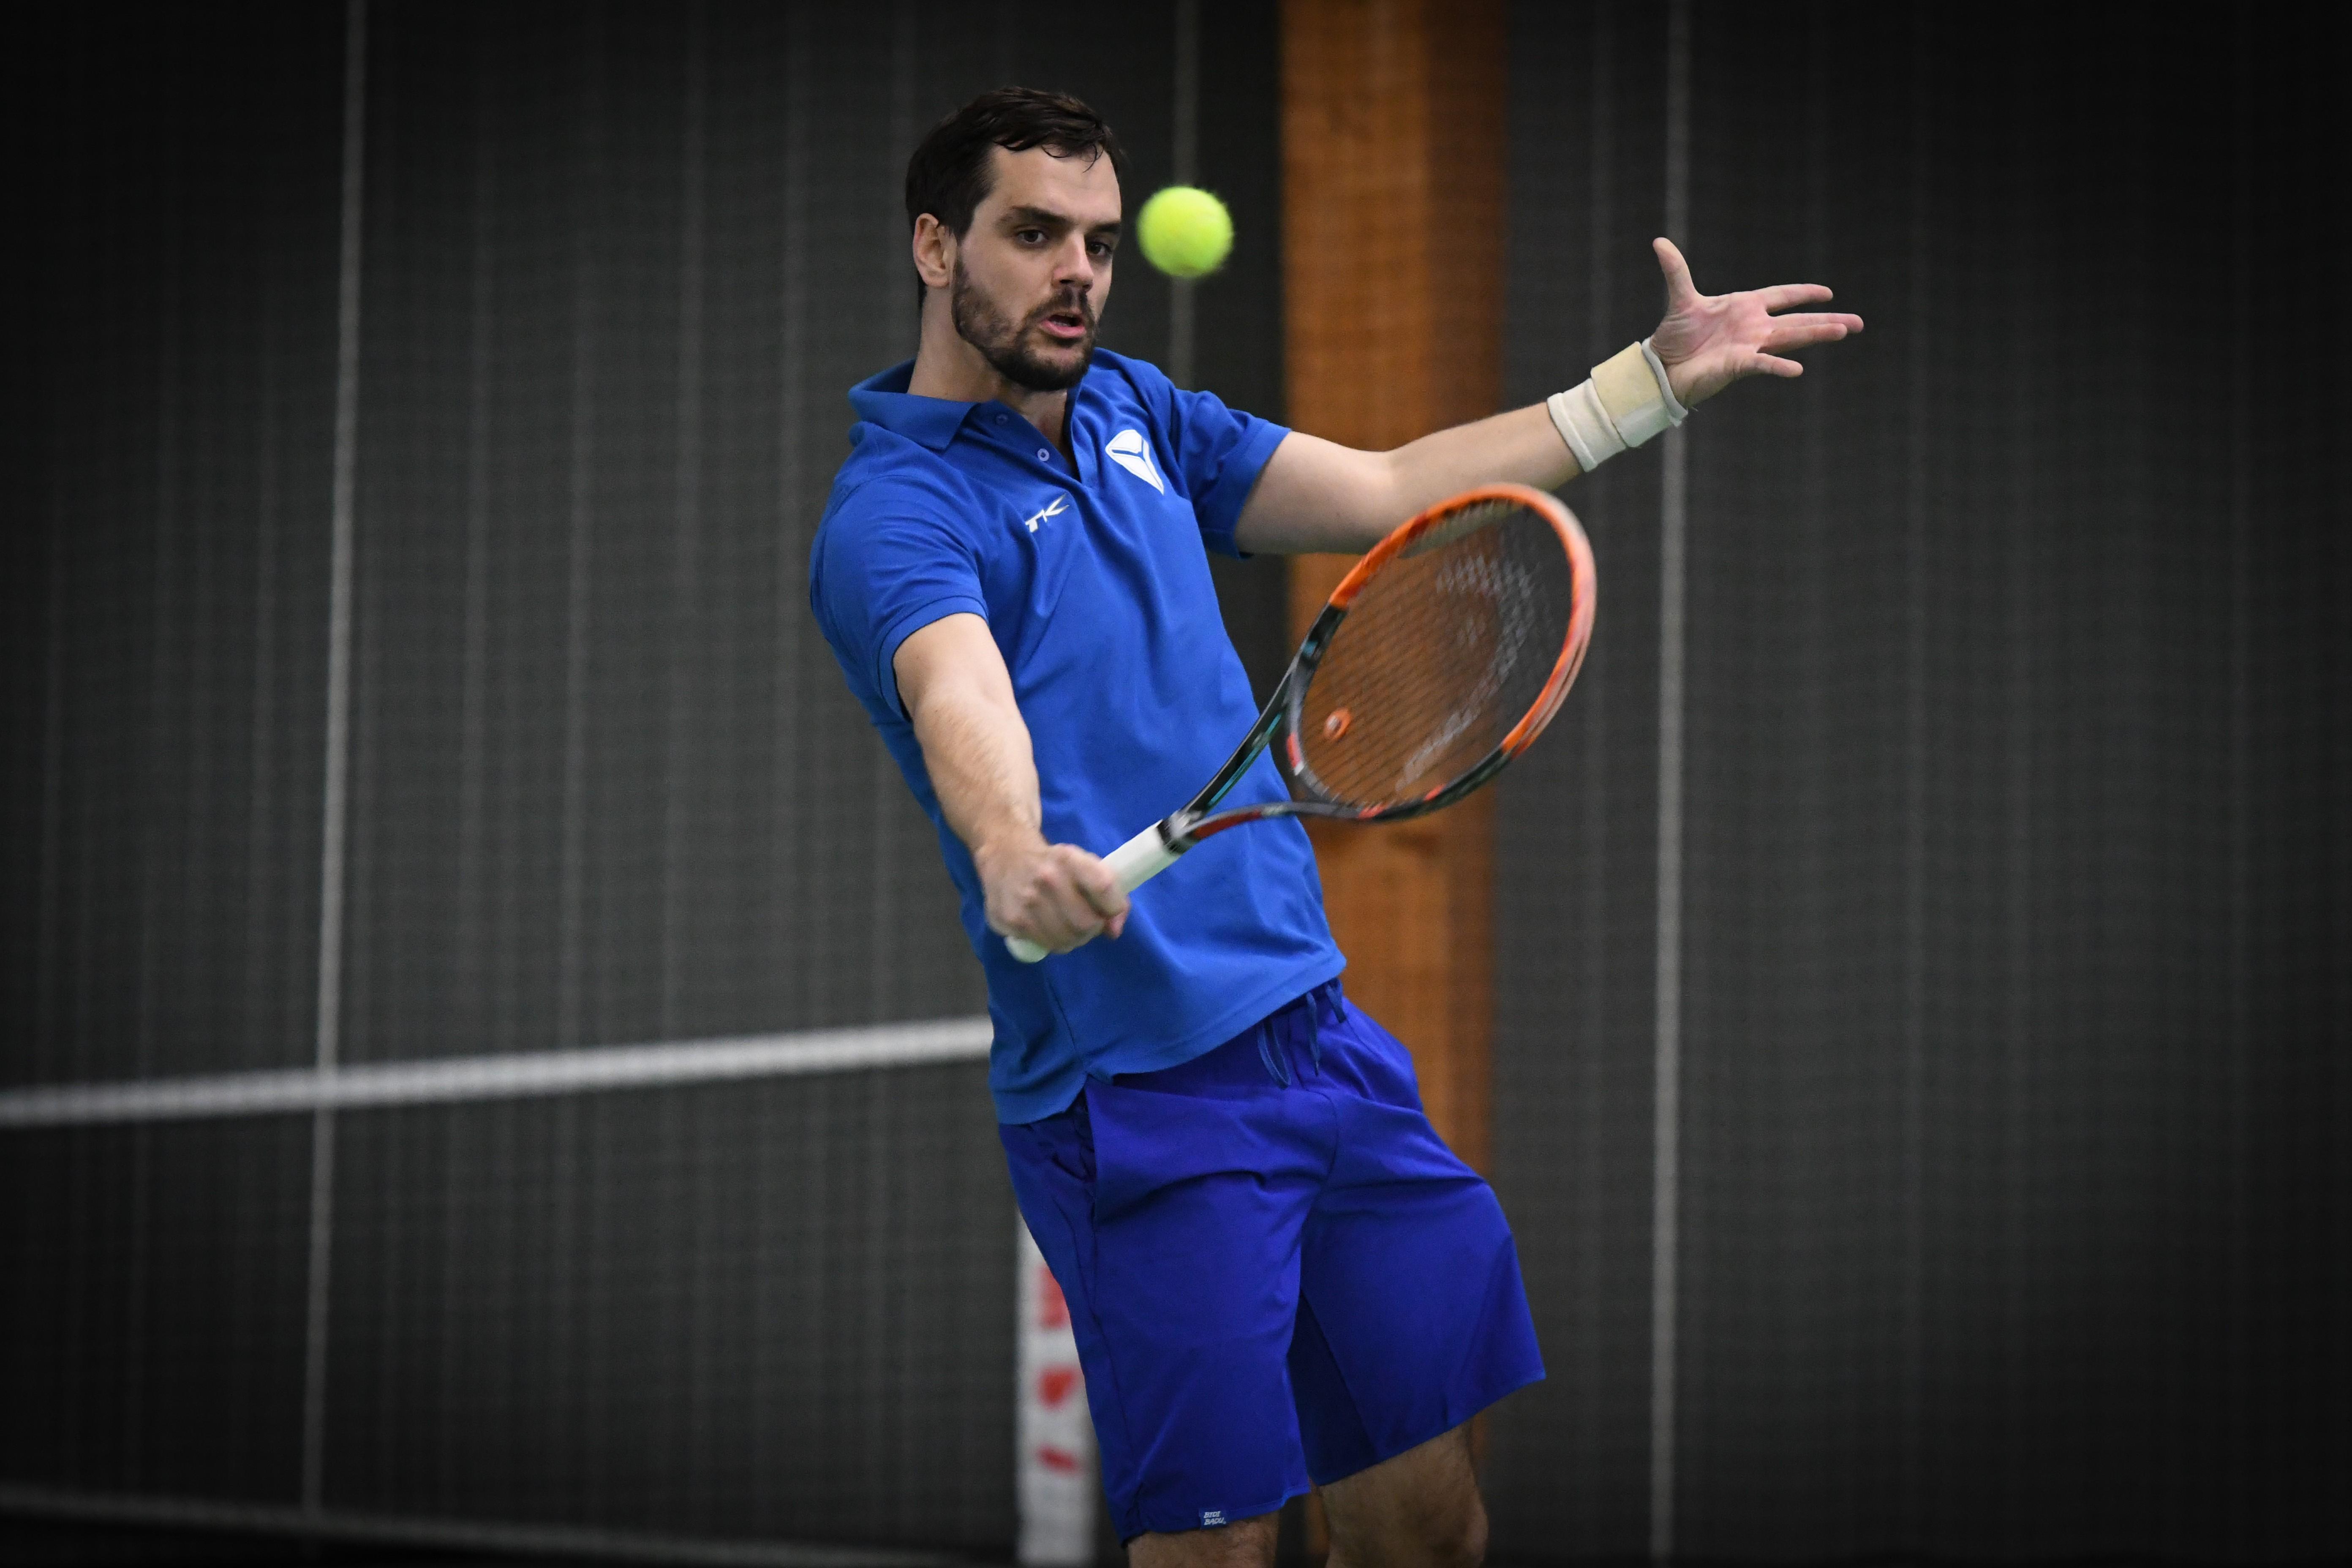 Lucas Leppin TTK Tontaubenklub Sachsenwald Tennis Wentdorf Wohltorf Hamburg